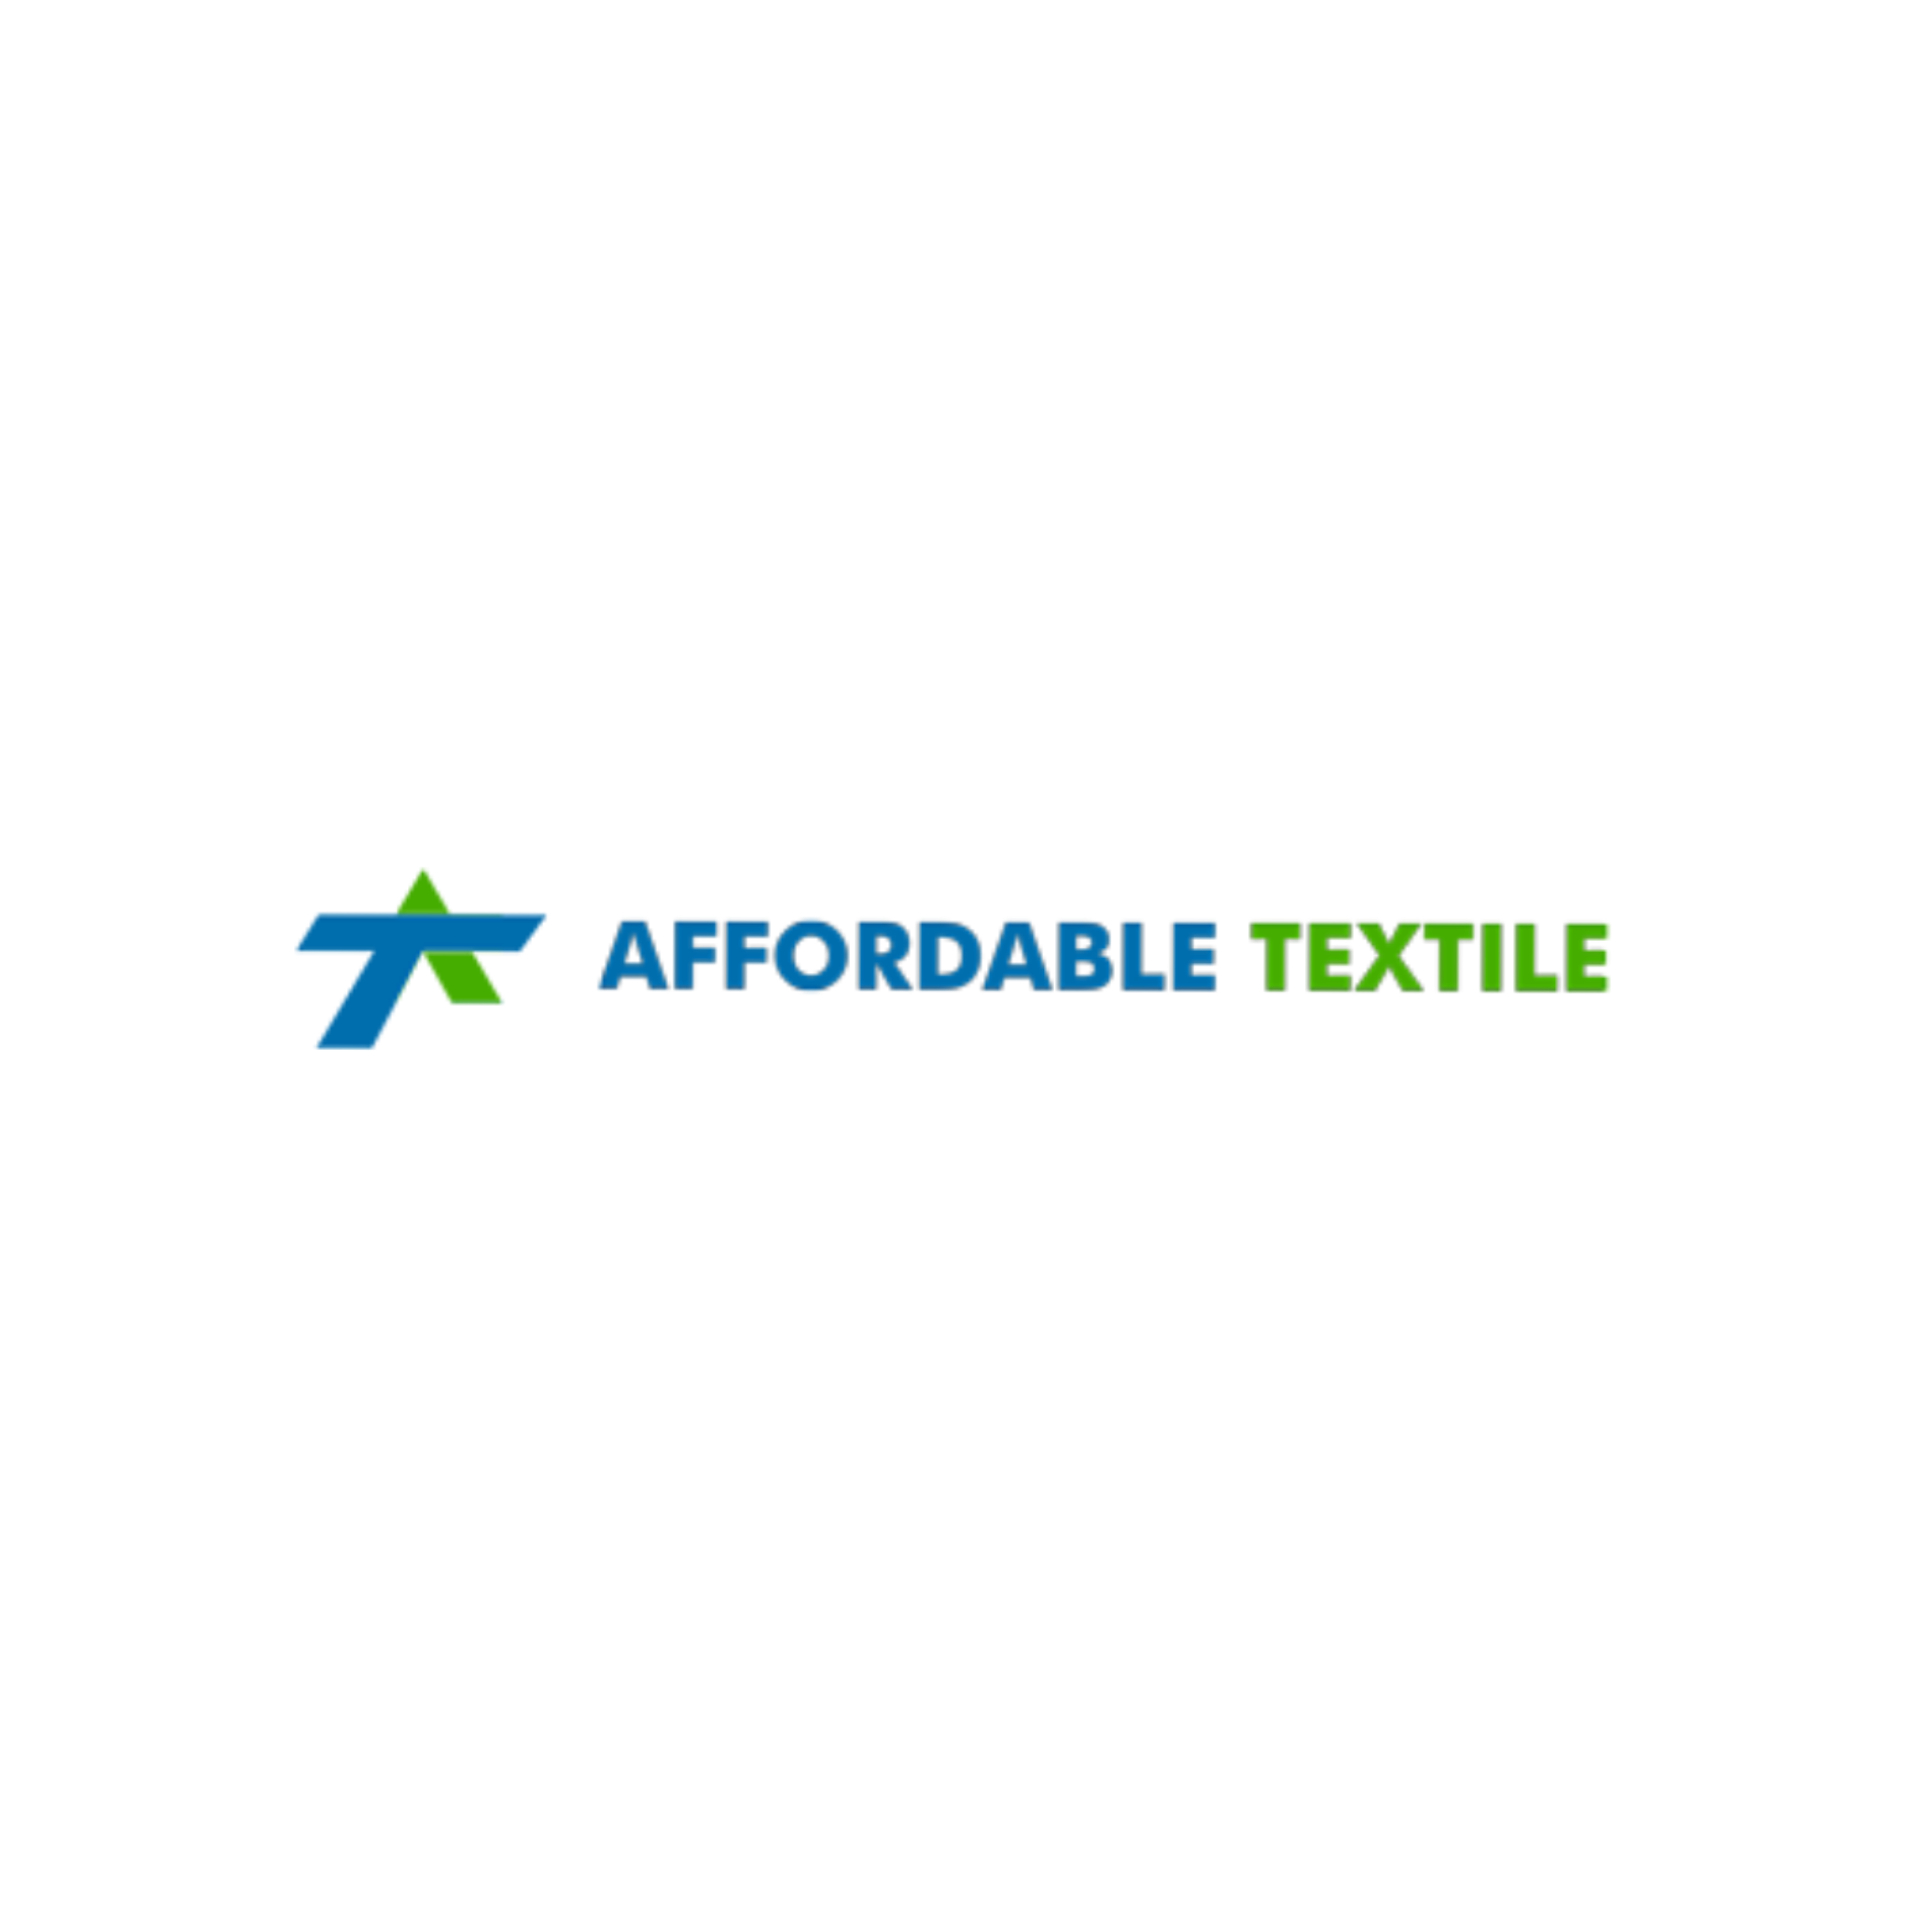 Affordable Textile